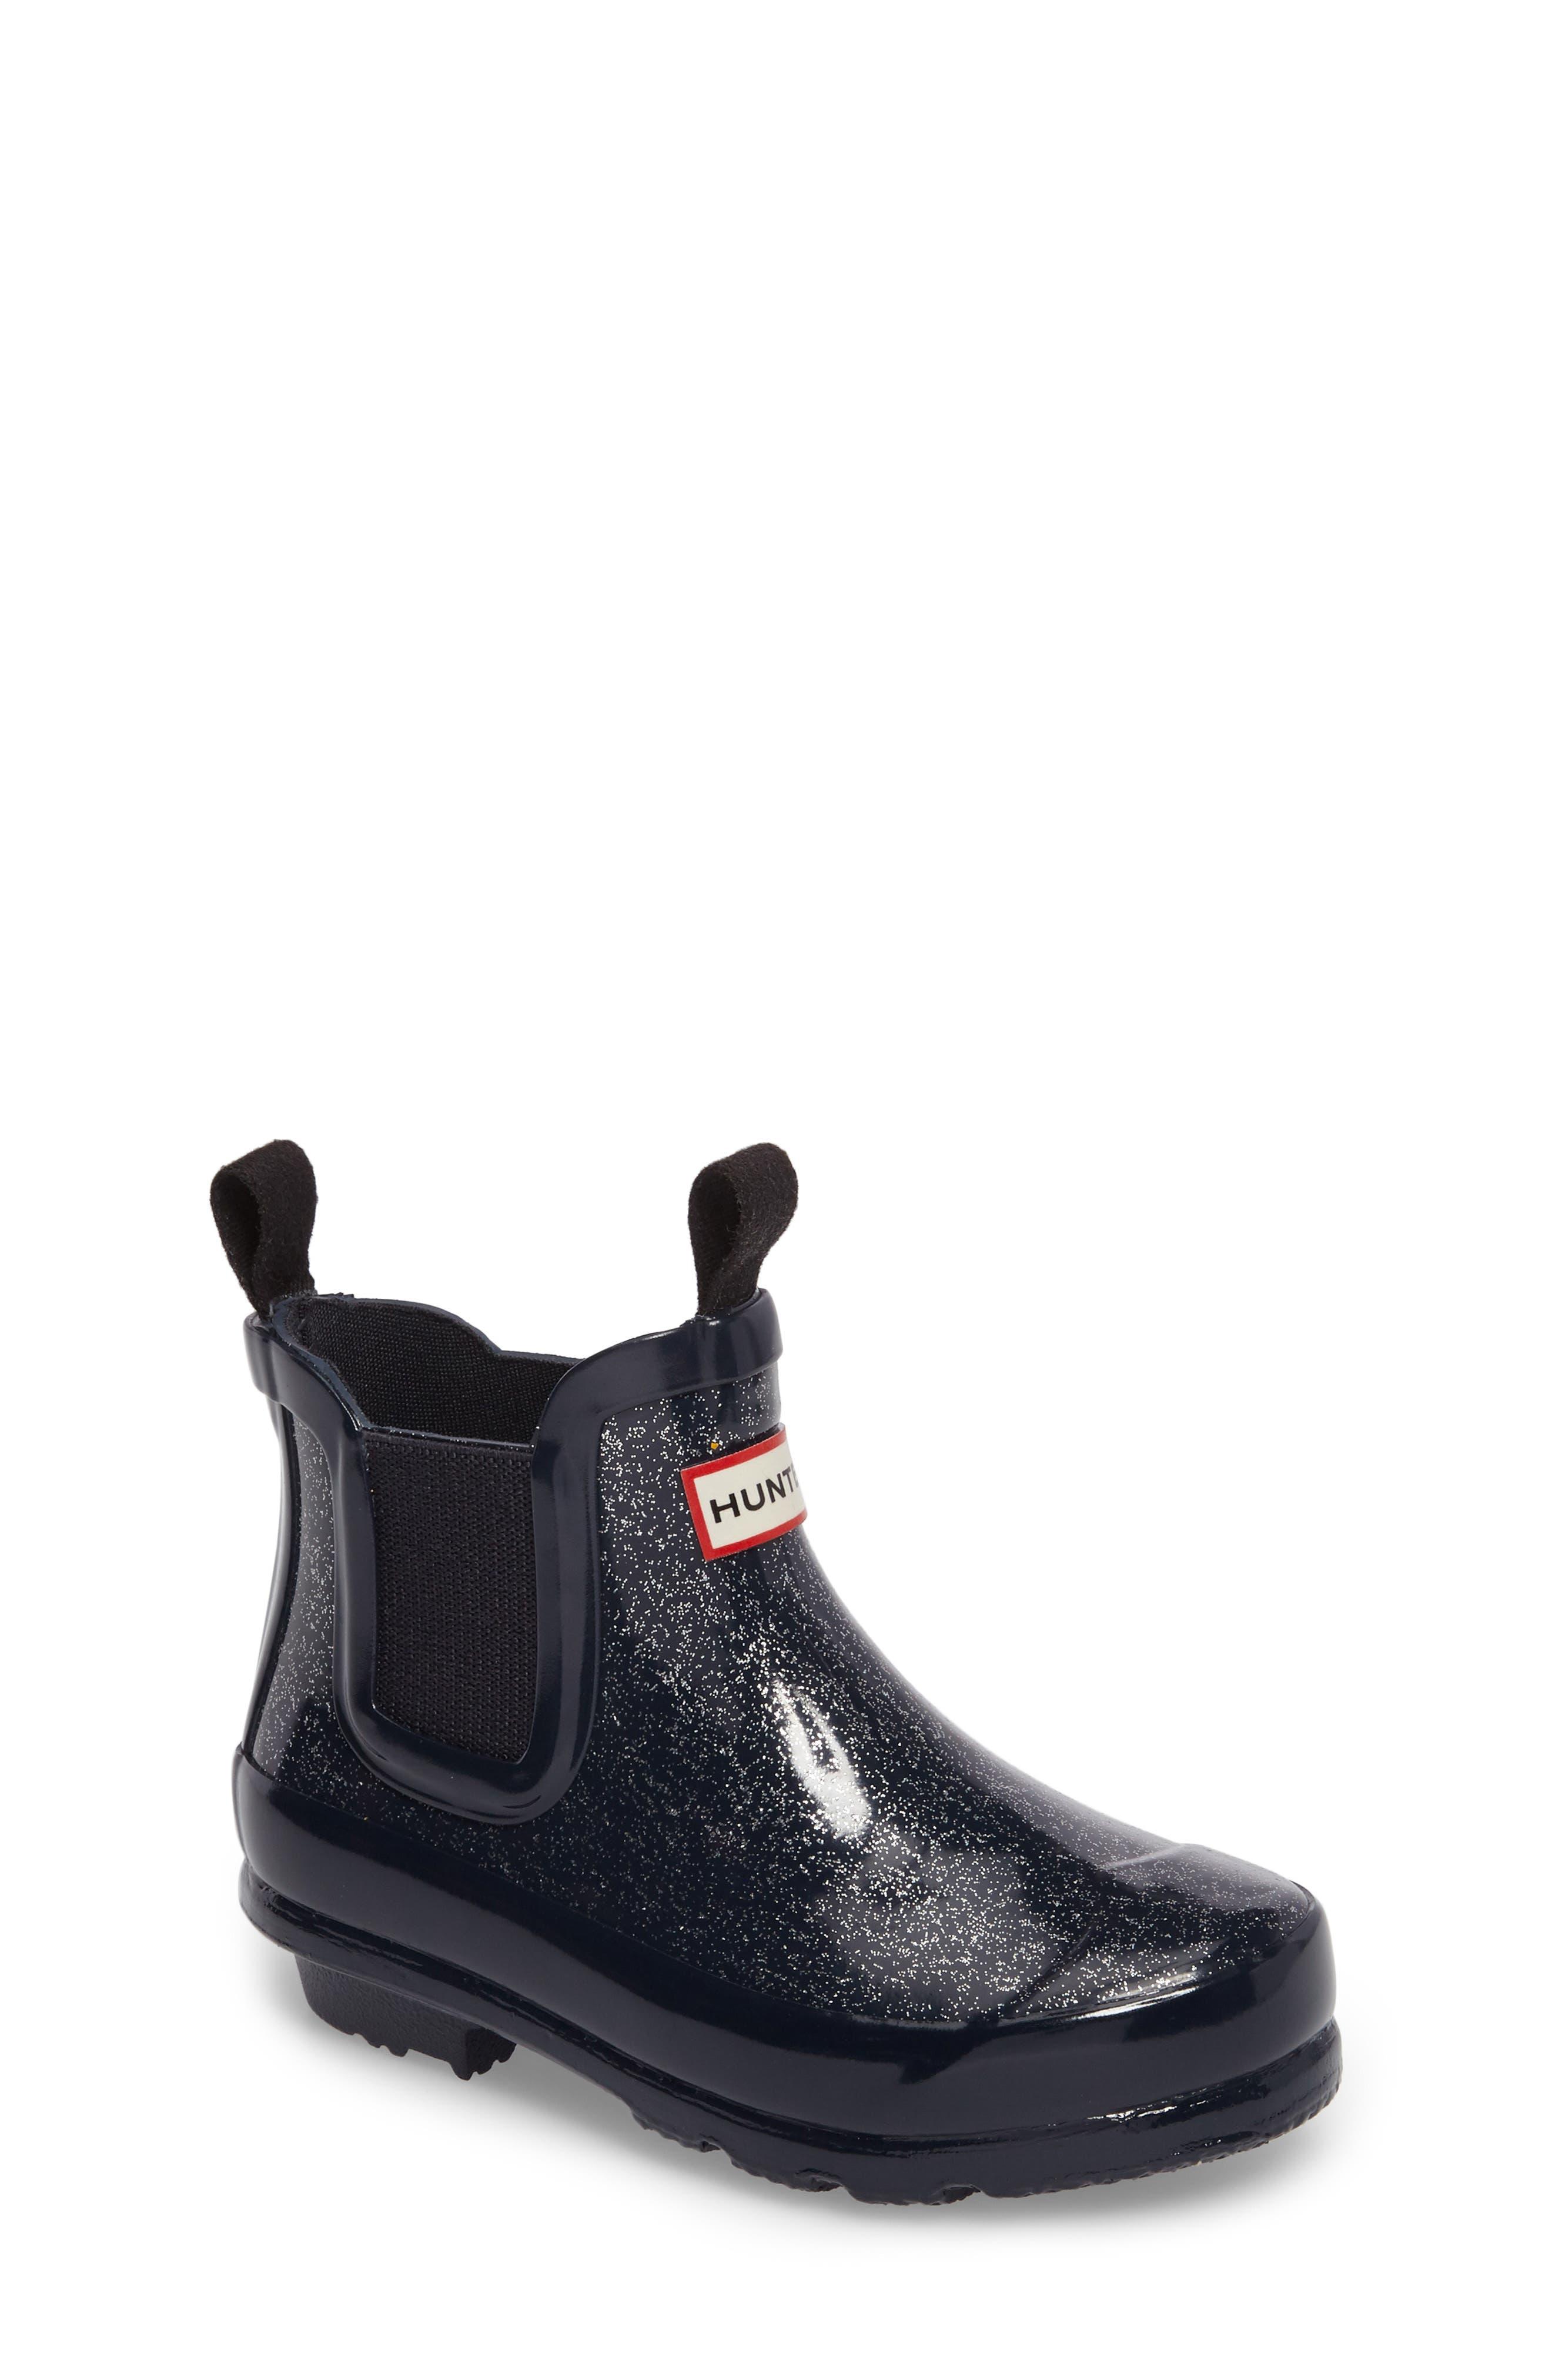 Alternate Image 1 Selected - Hunter Originals Glittery Waterproof Chelsea Boot (Toddler)